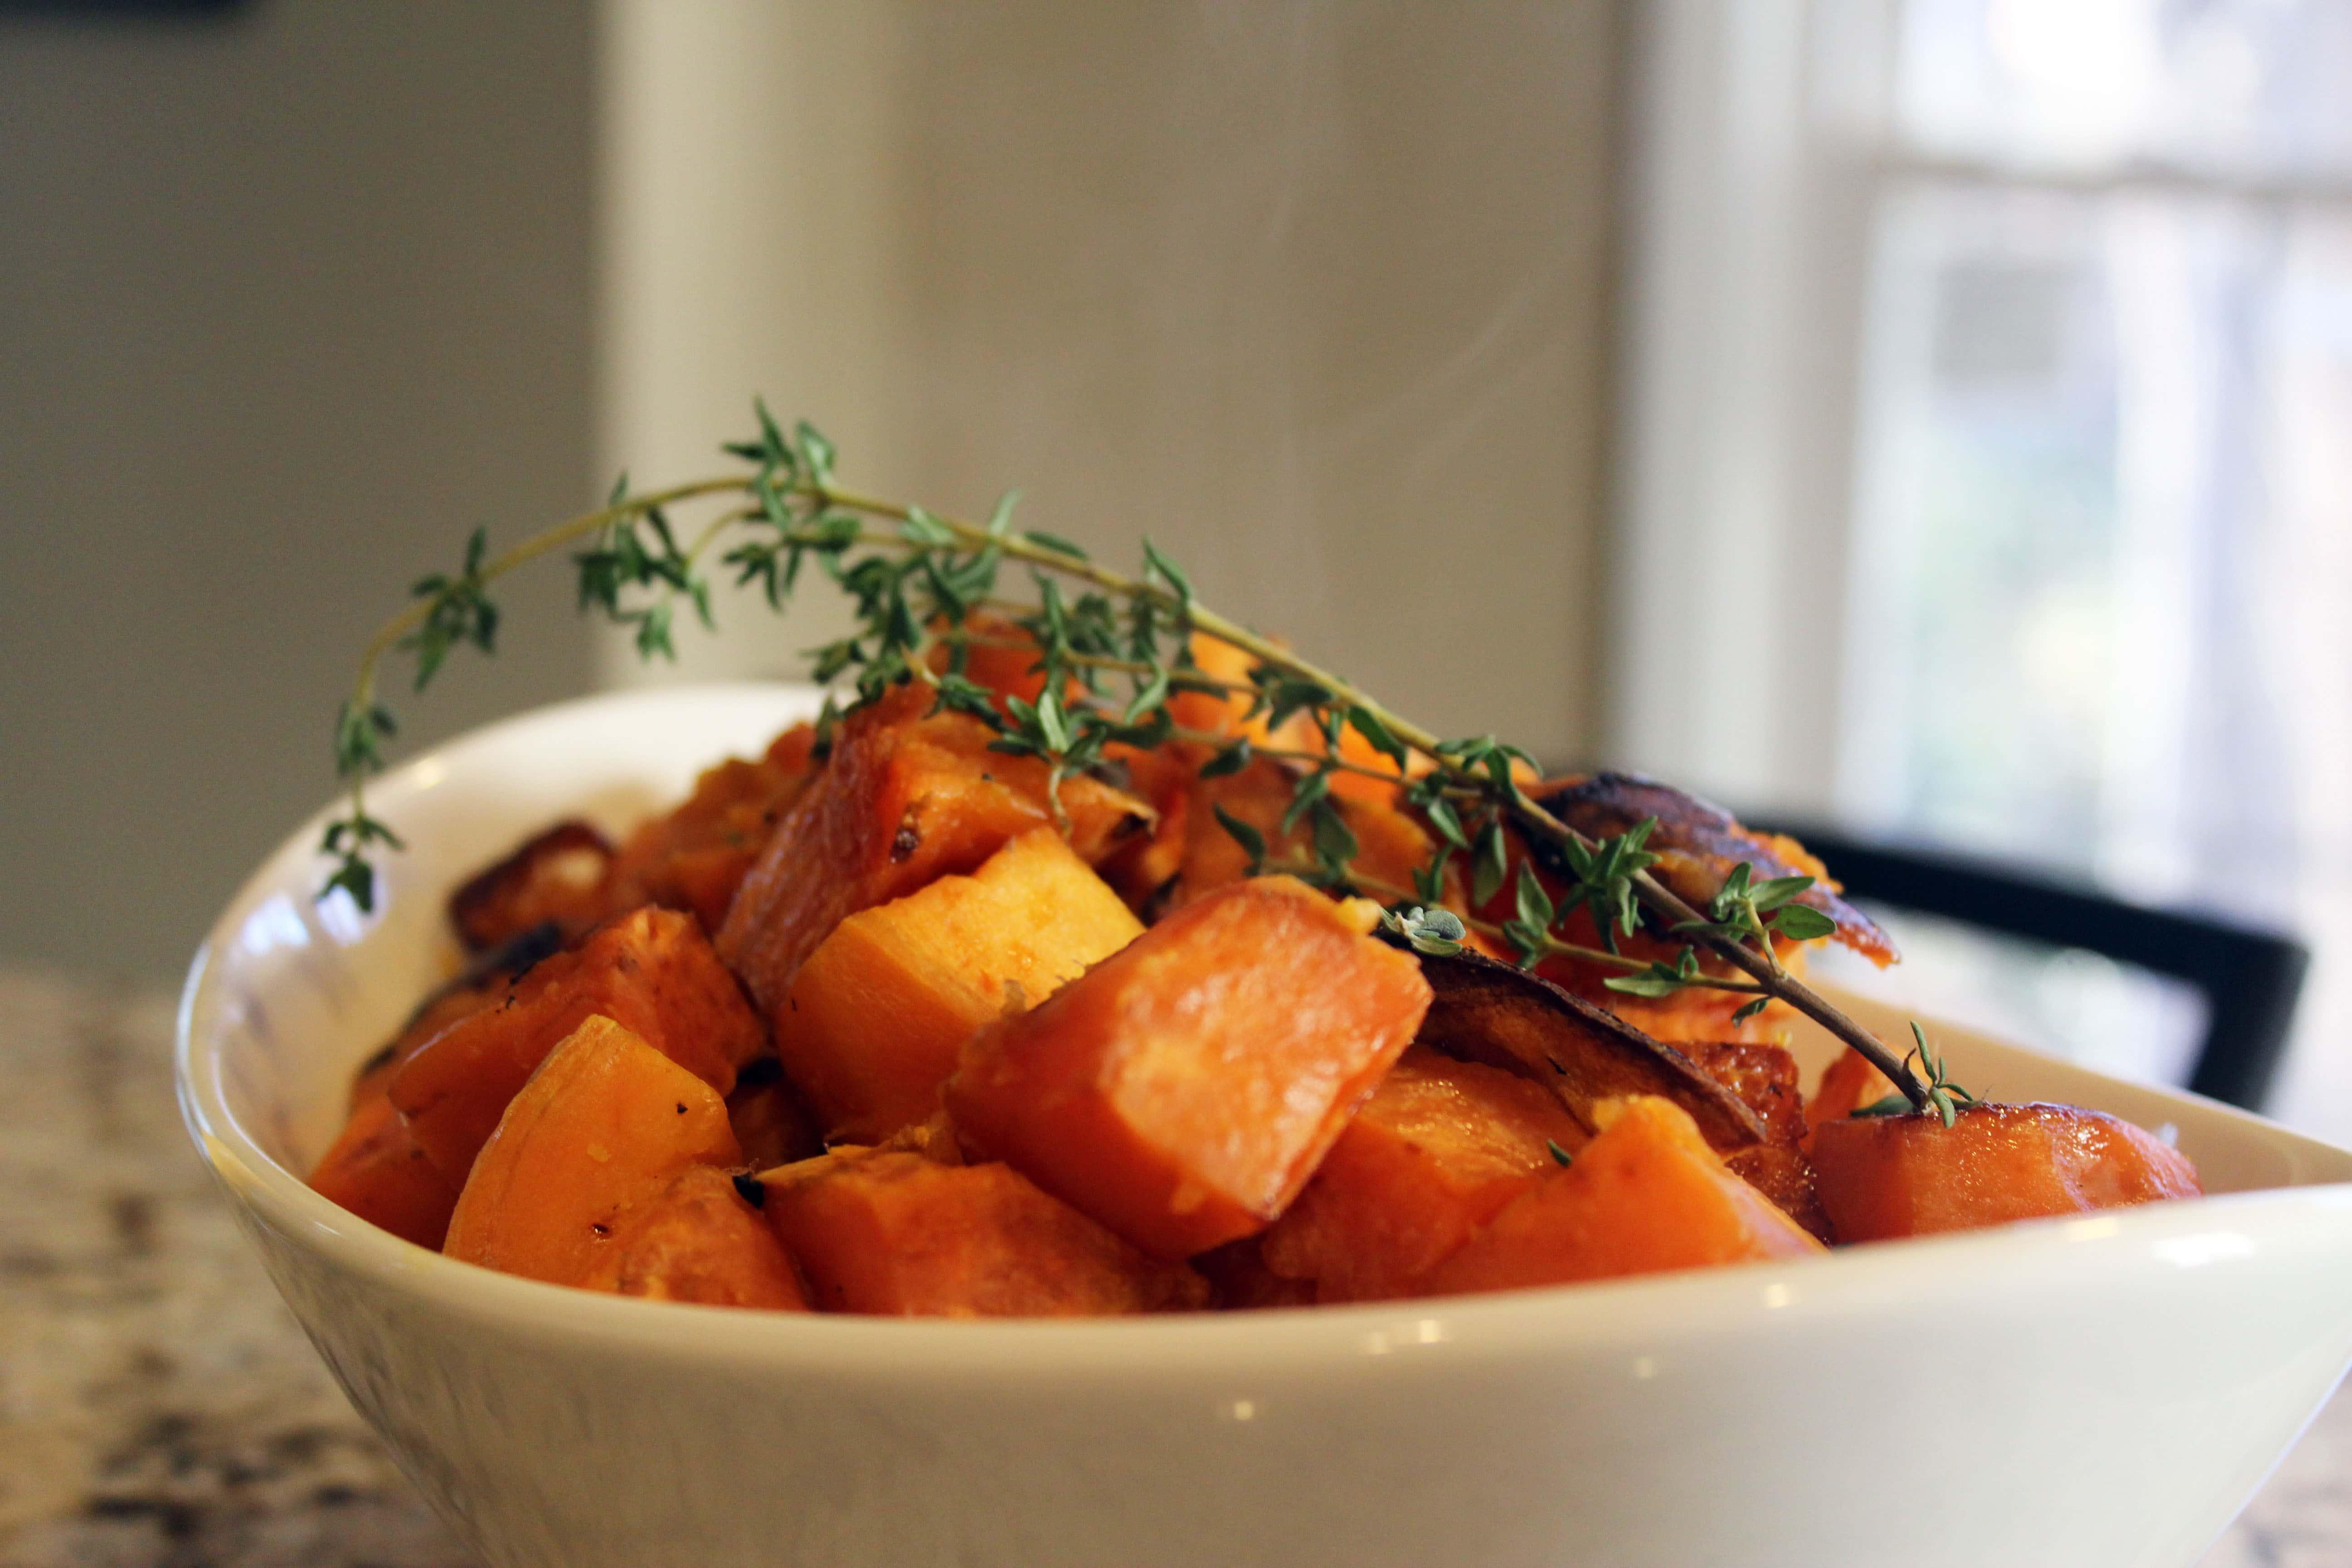 Bowl of sweet potato